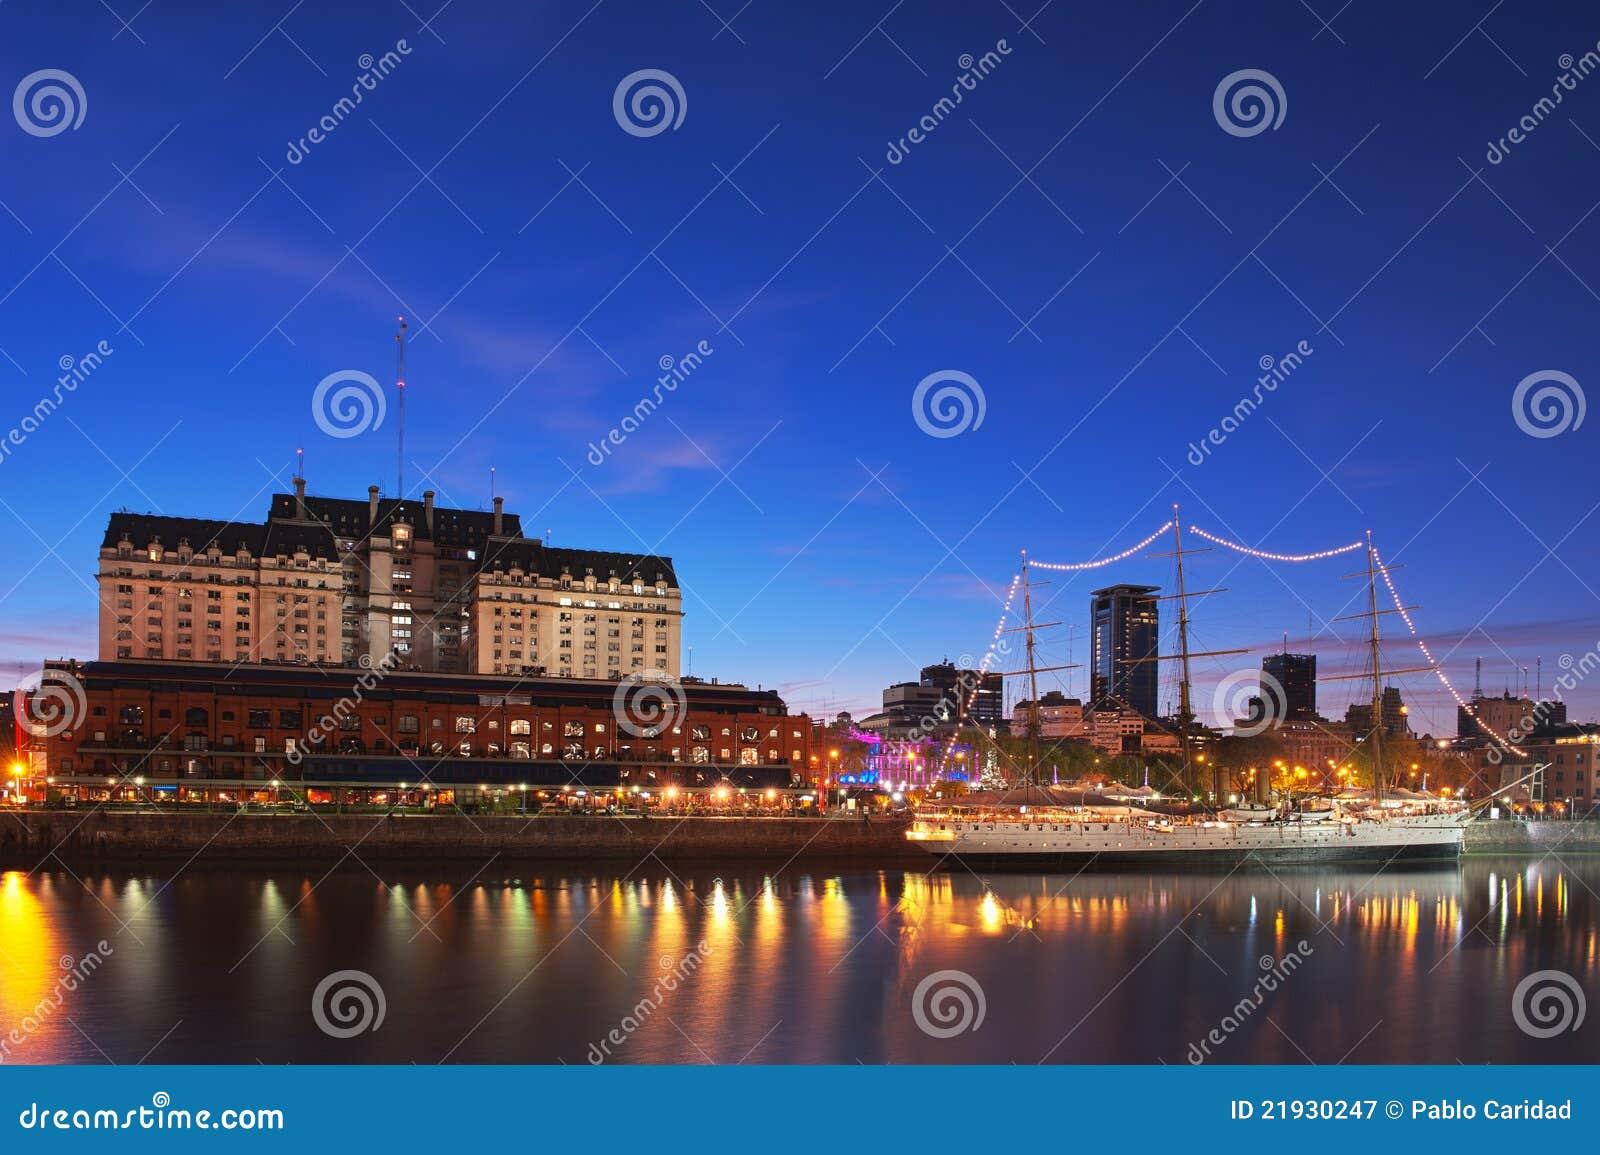 Puerto Madero at Night, Buenos Aires, Argentina.